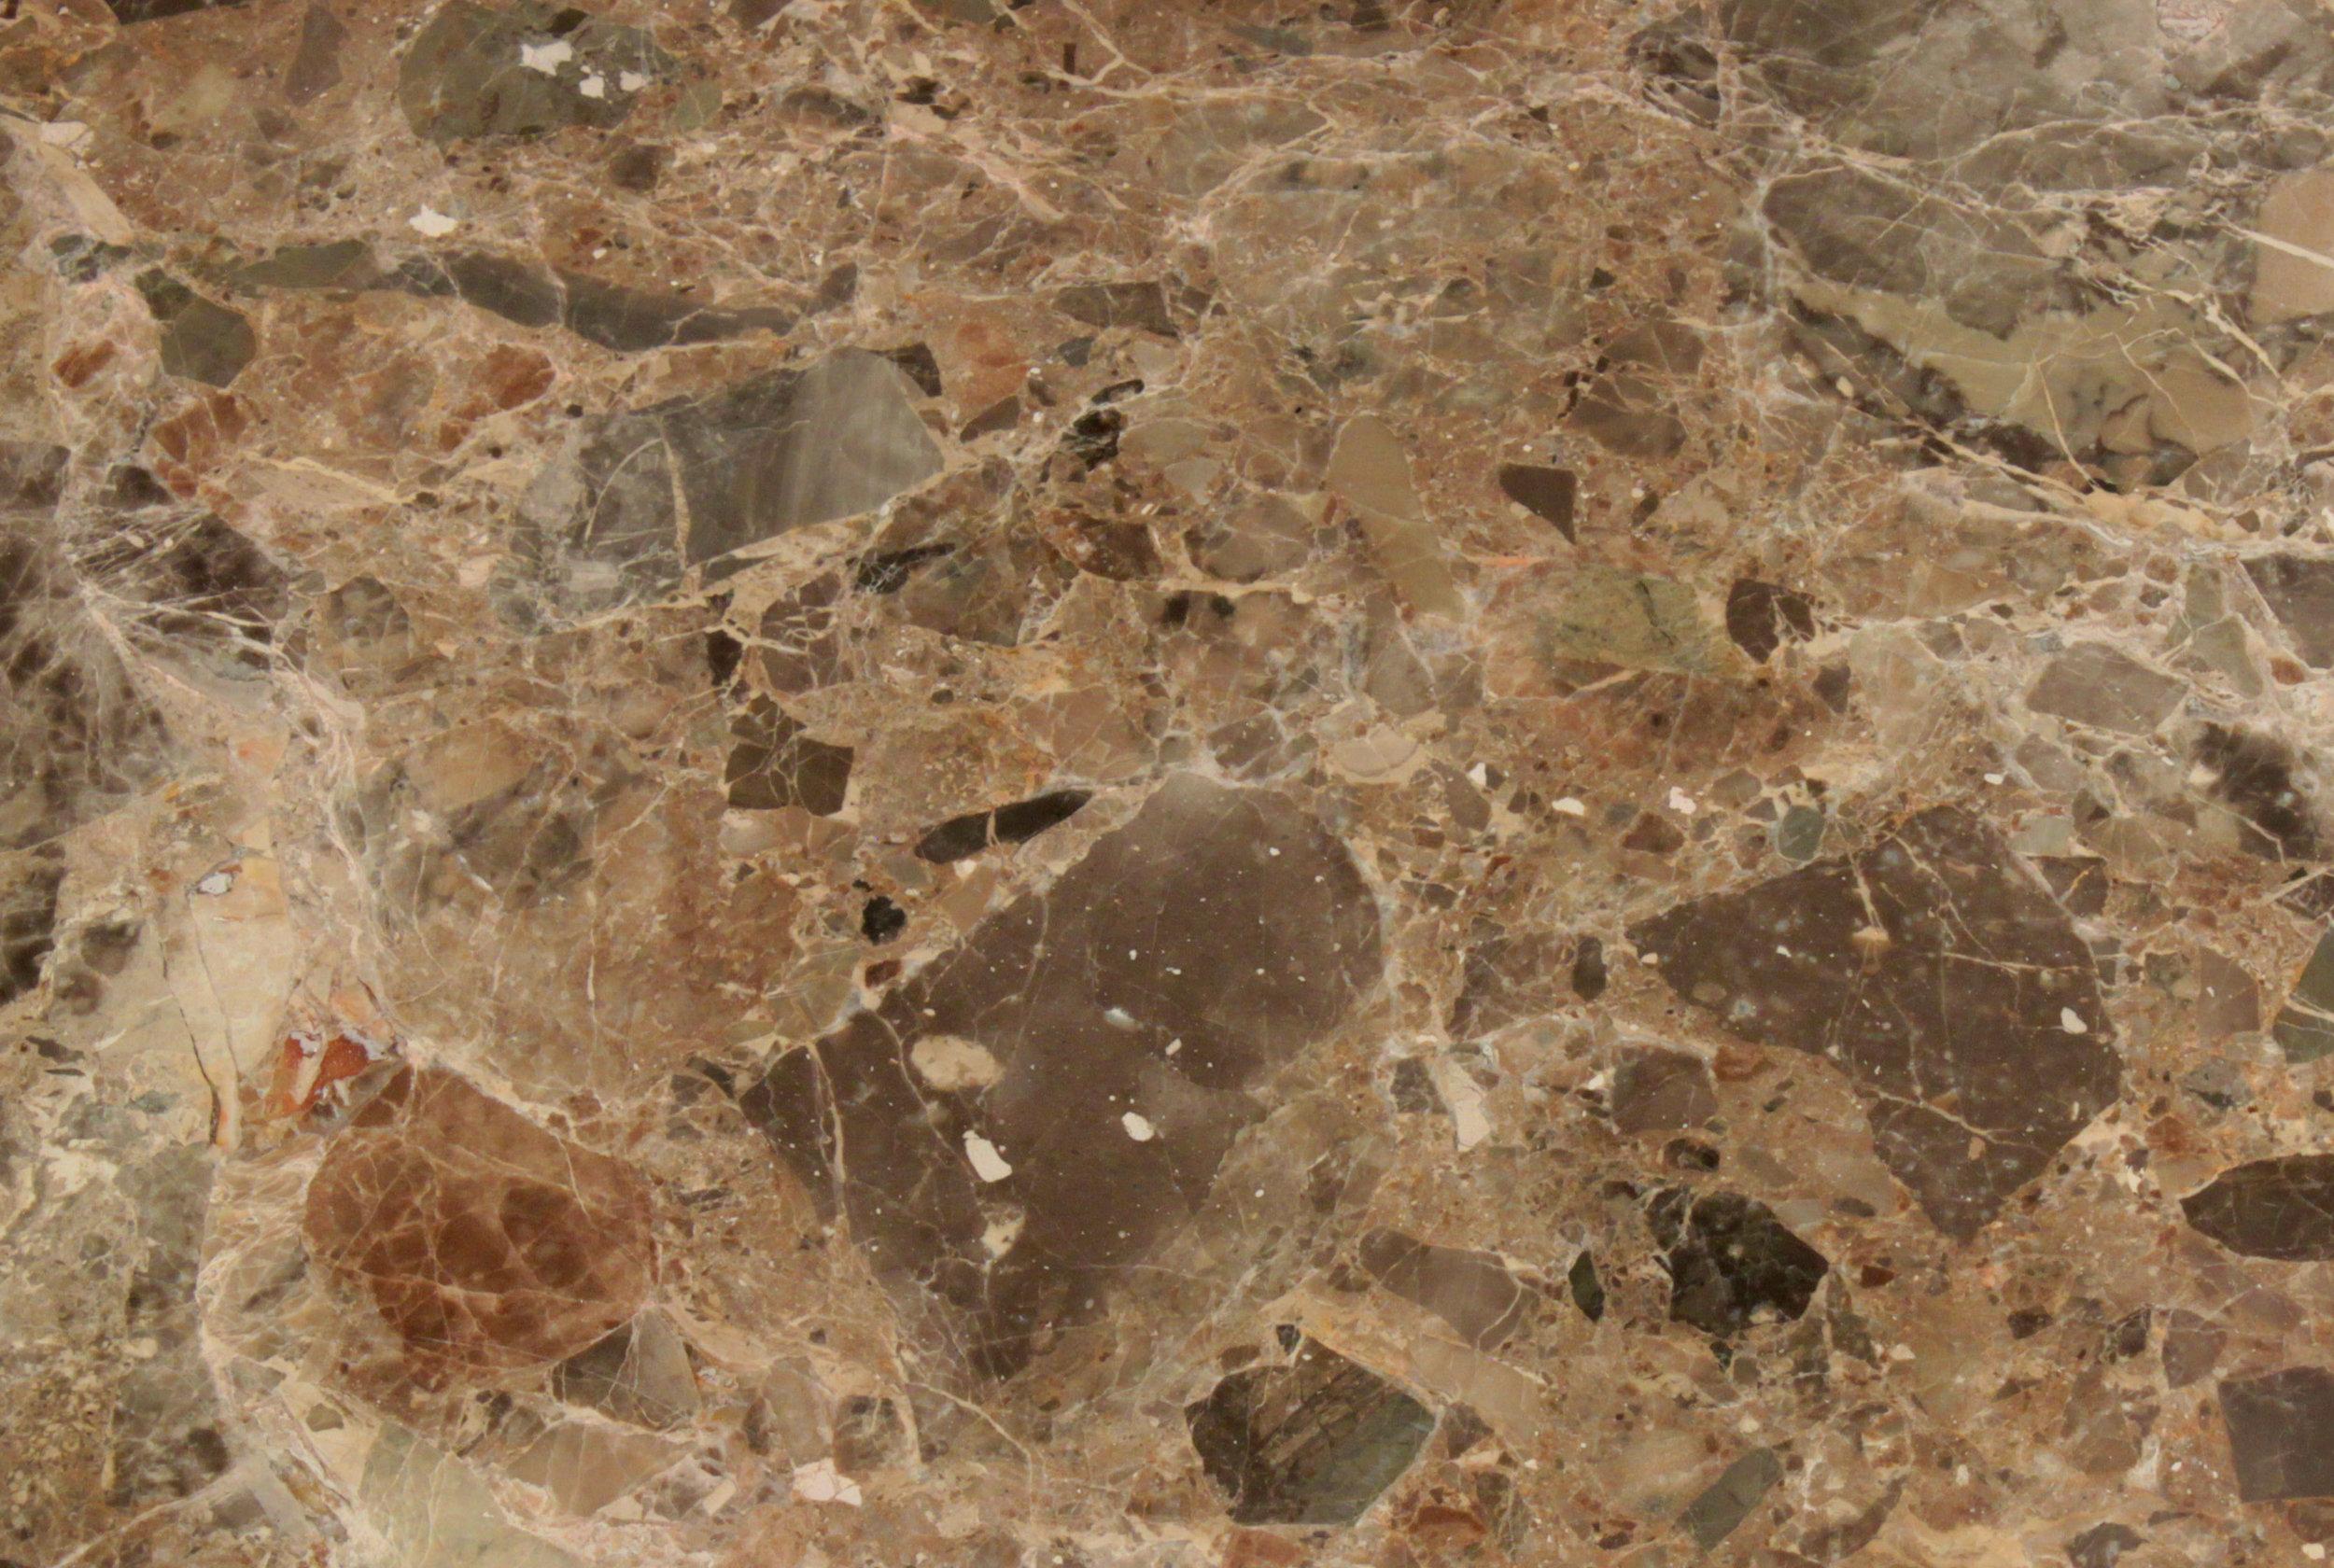 Brueton 75 polished steel+marble coffeetable85 detail2 hires.JPG